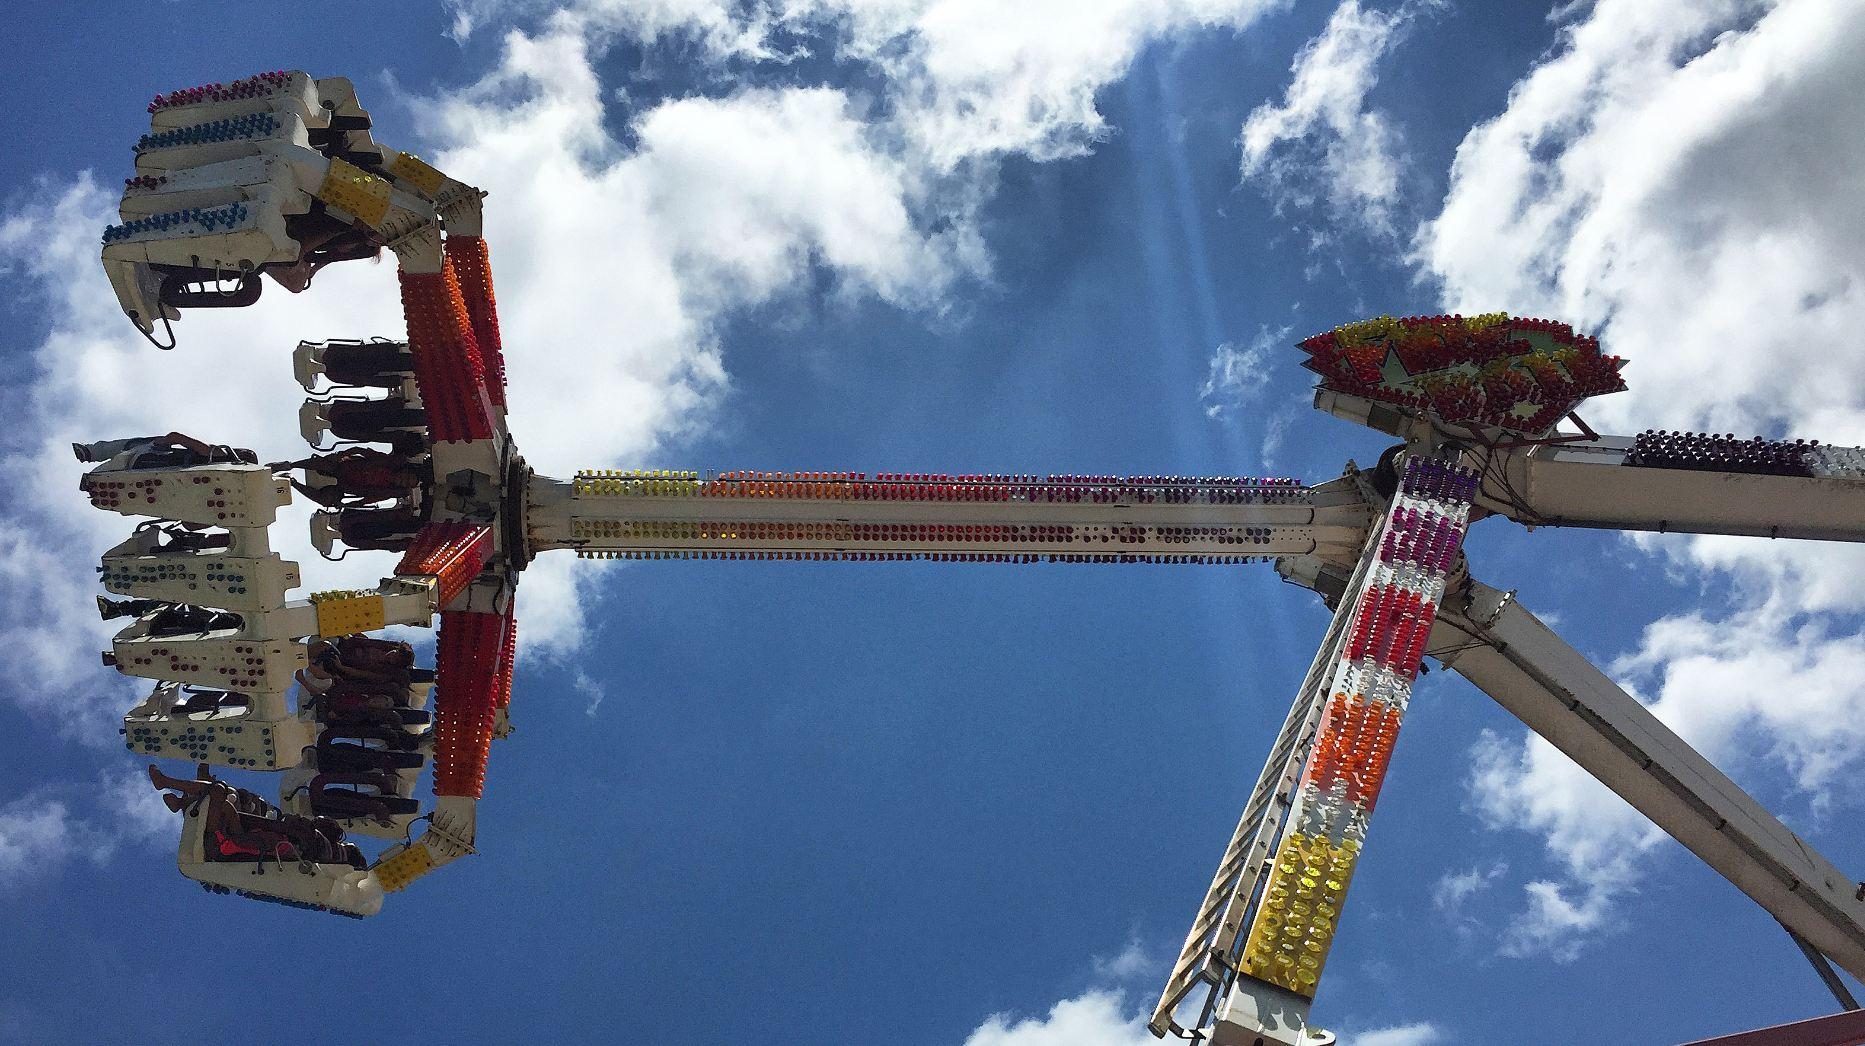 TRF Fire Ball fair carnival ride attraction three rivers festival_272982